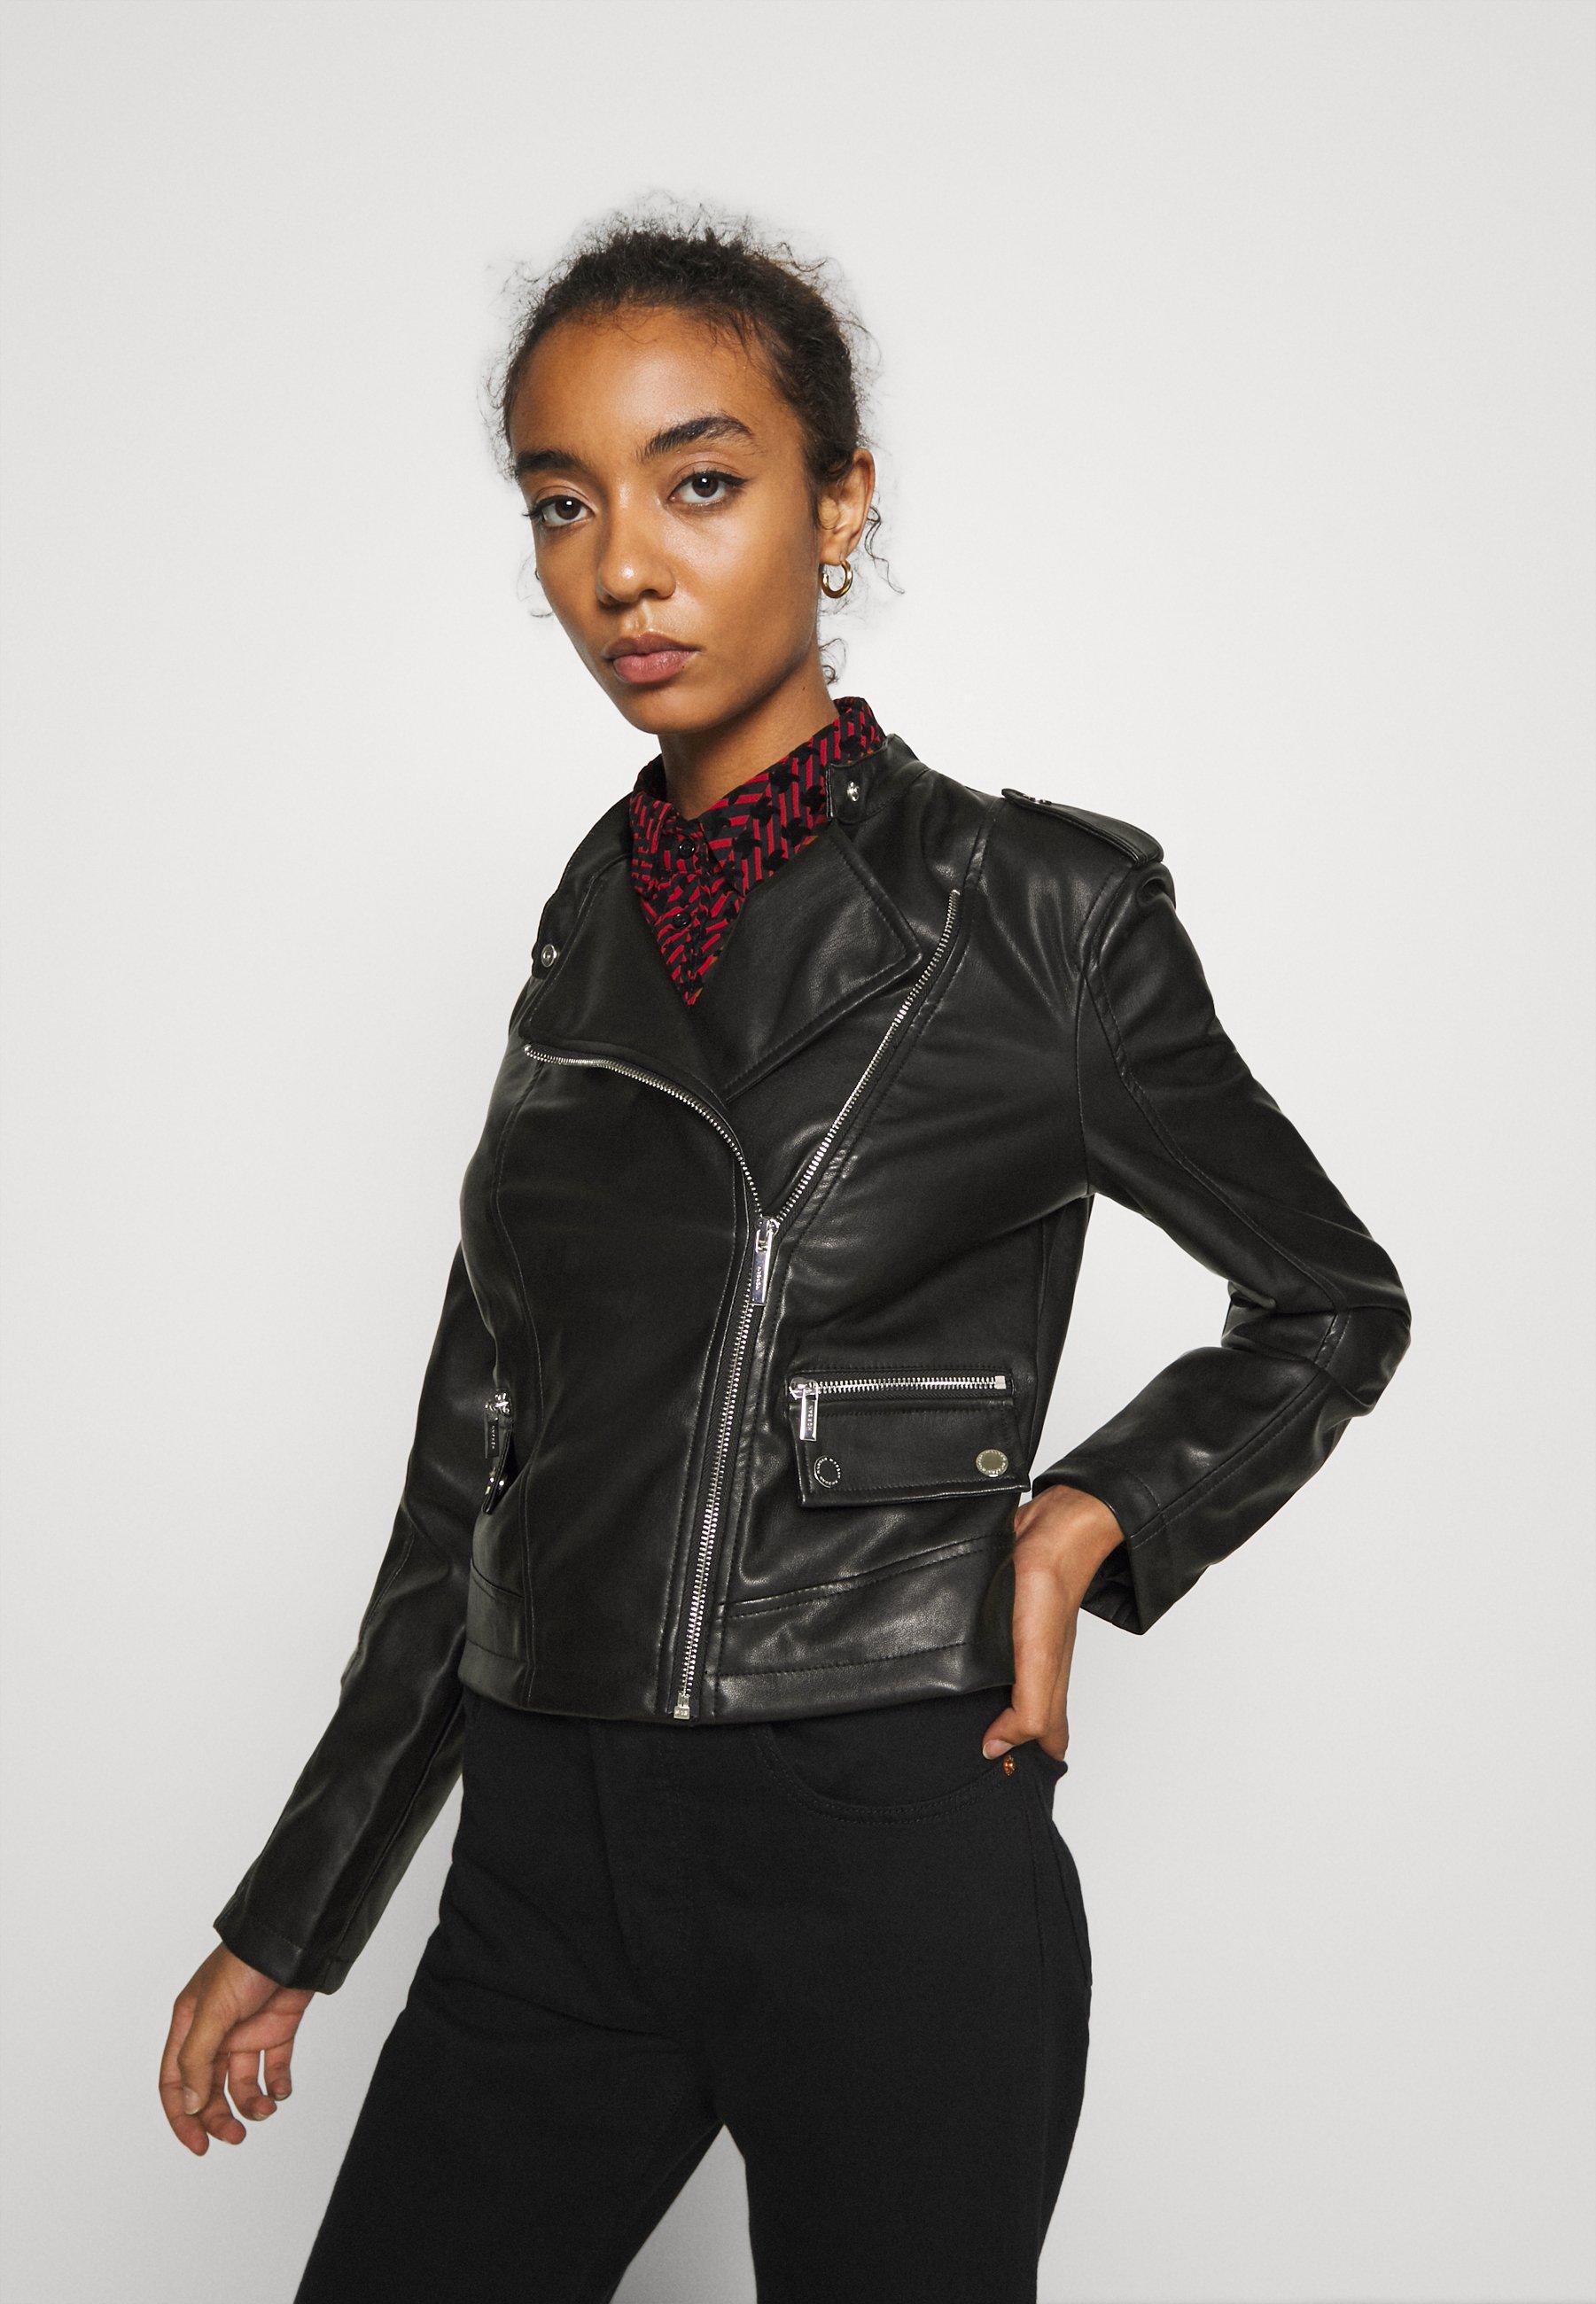 Morgan Veste en similicuir - noir - Vestes Femme QiCzK